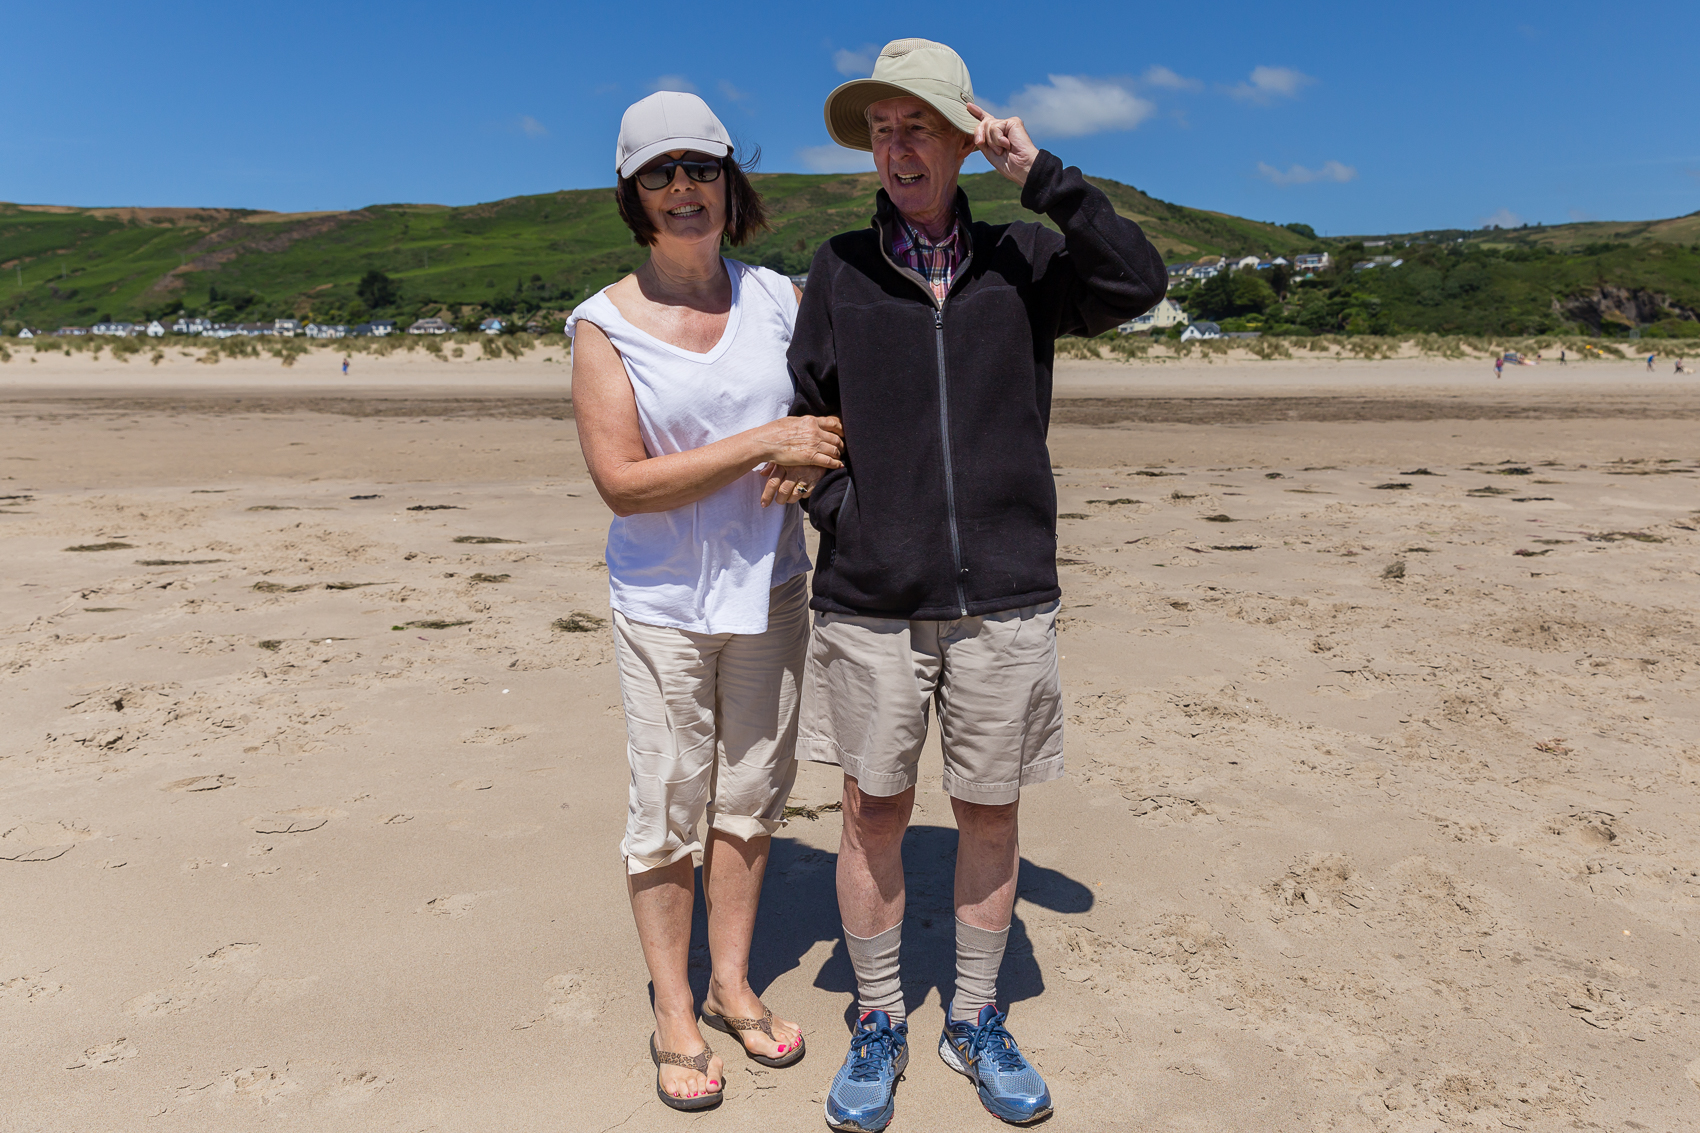 Socks and sneakers on the beach...oh Nigel. xoxo